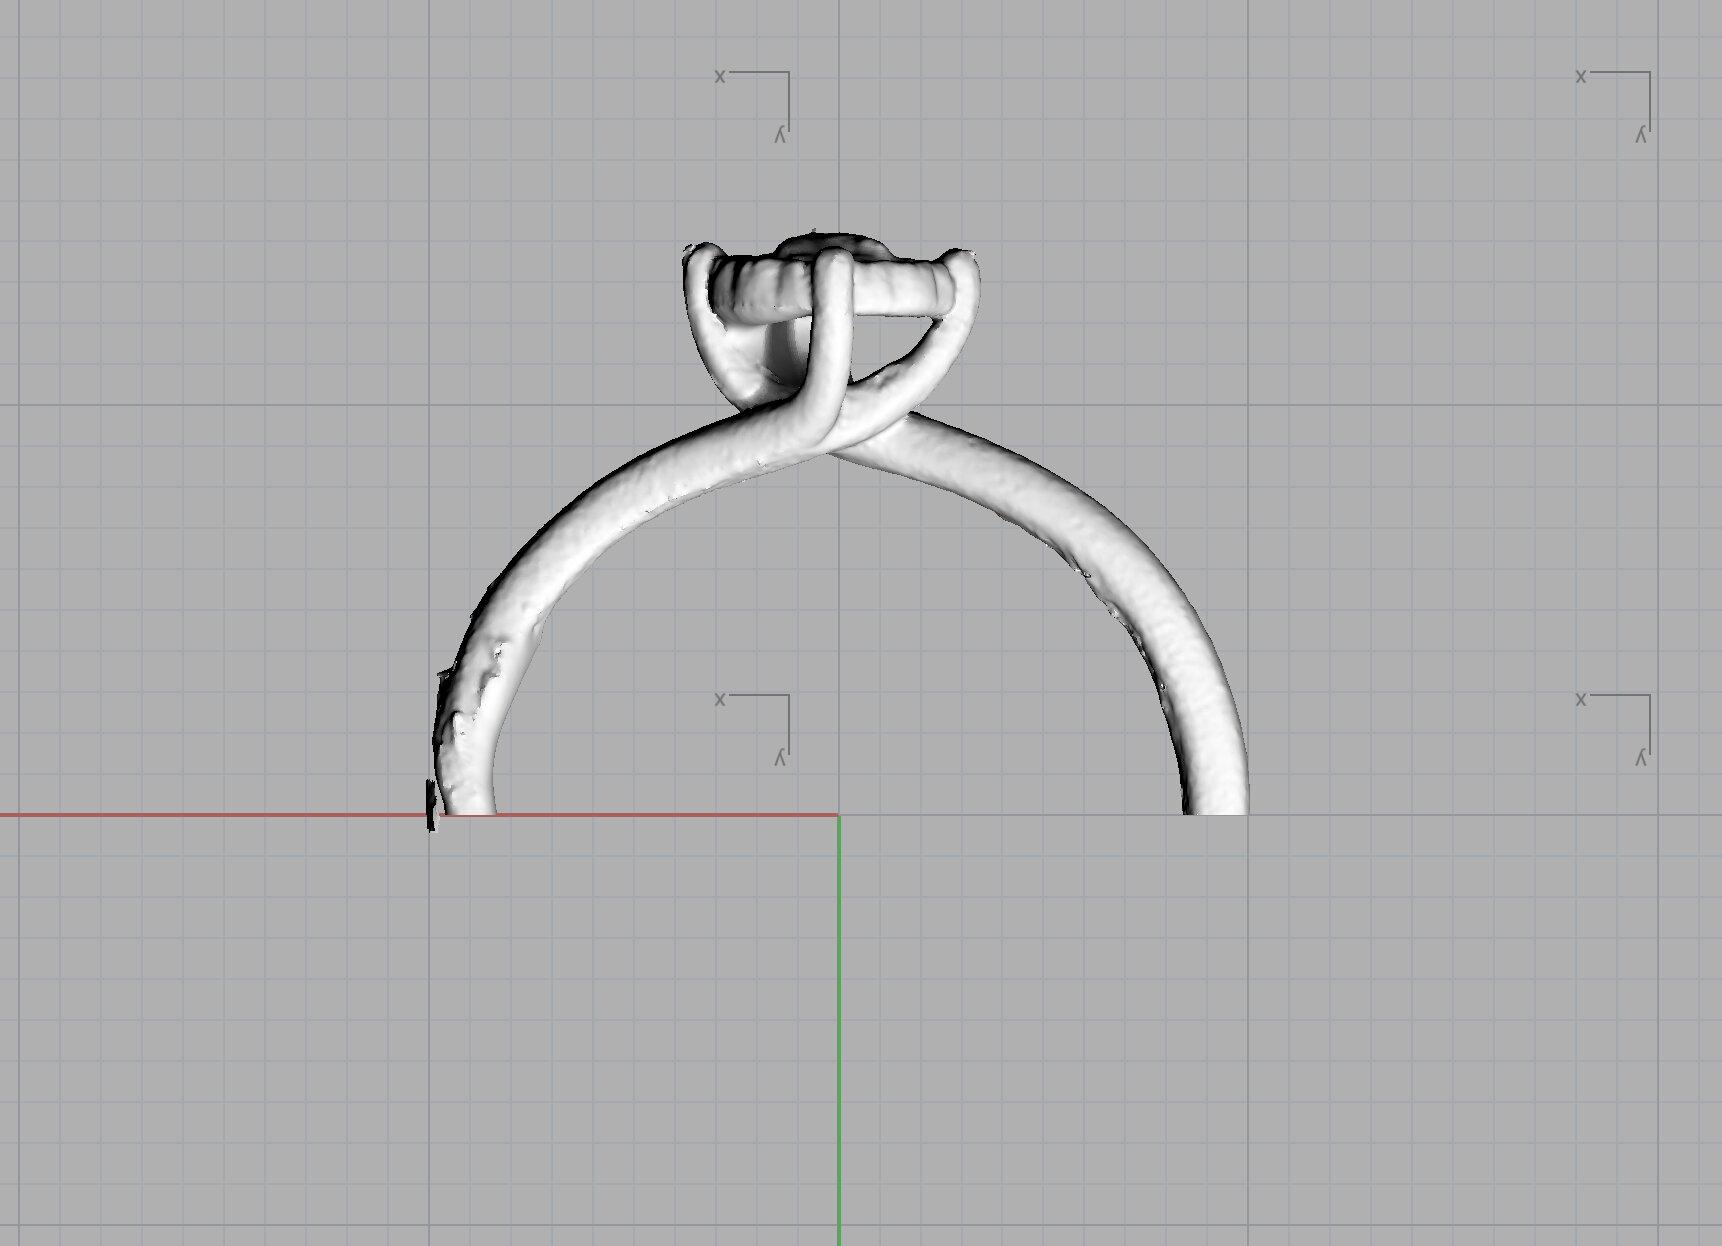 3D Scan of Karen's Engagement Ring